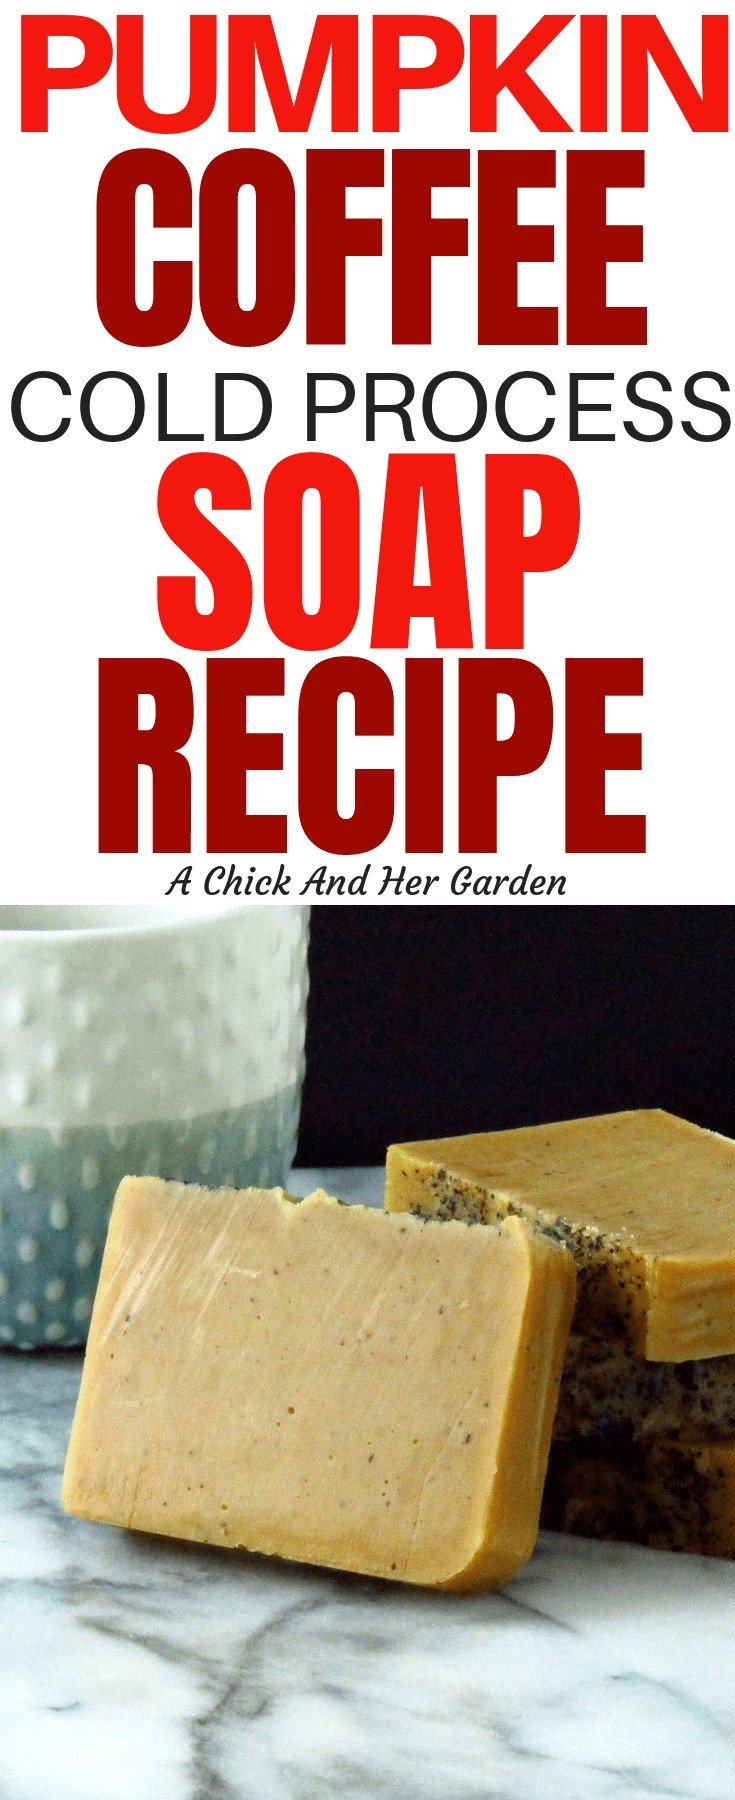 Finally! It's pumpkin spice season! This pumpkin coffee soap recipe was perfect for the fall!! #fallsoap #soaprecipes #coldprocesssoap #achickandhergarden